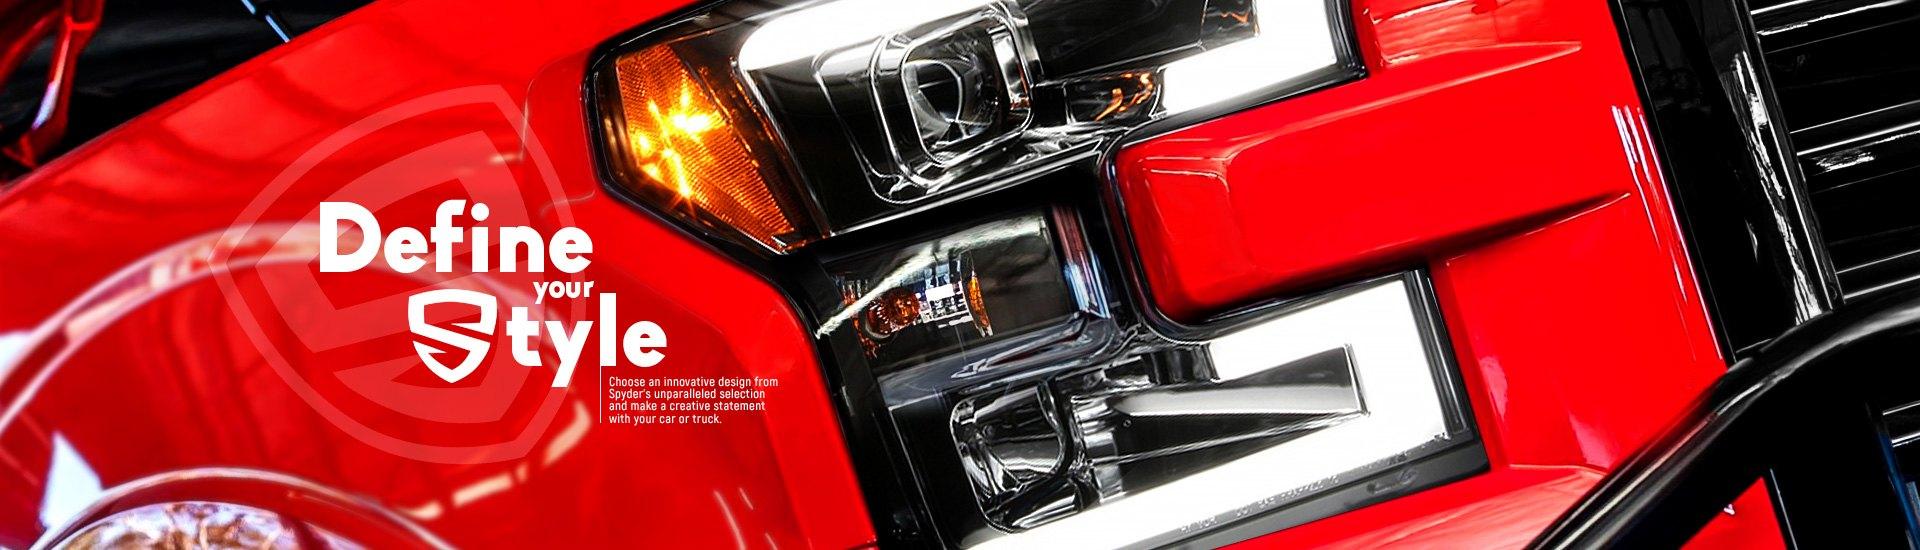 Automotive Lighting Headlights Tail Lights Leds Bulbs 2012 Colorado Fuse Box 4 11